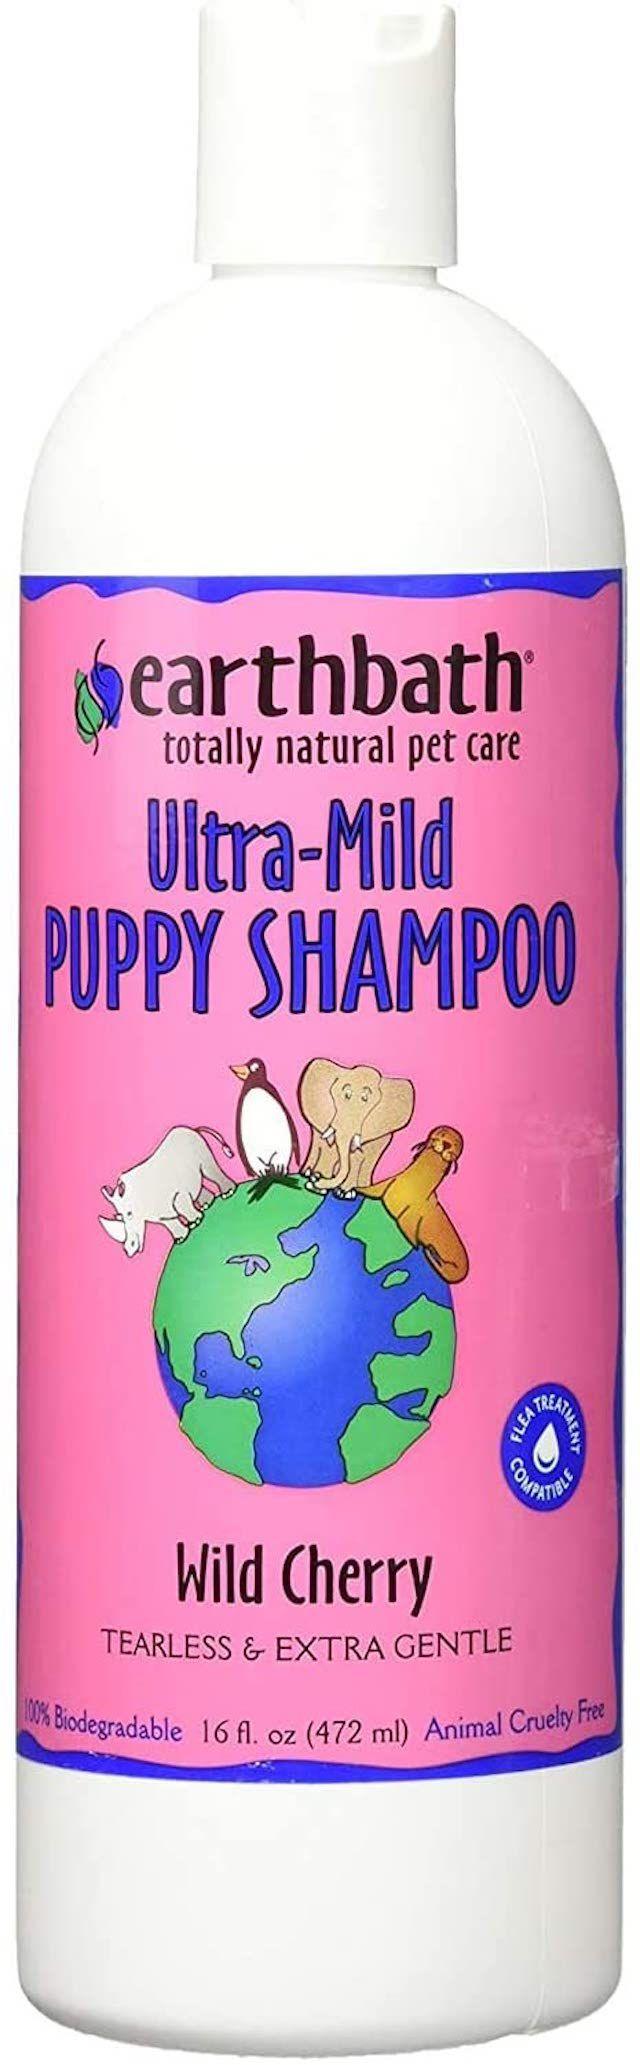 Earthbath Ultra-Mild Puppy Shampoo